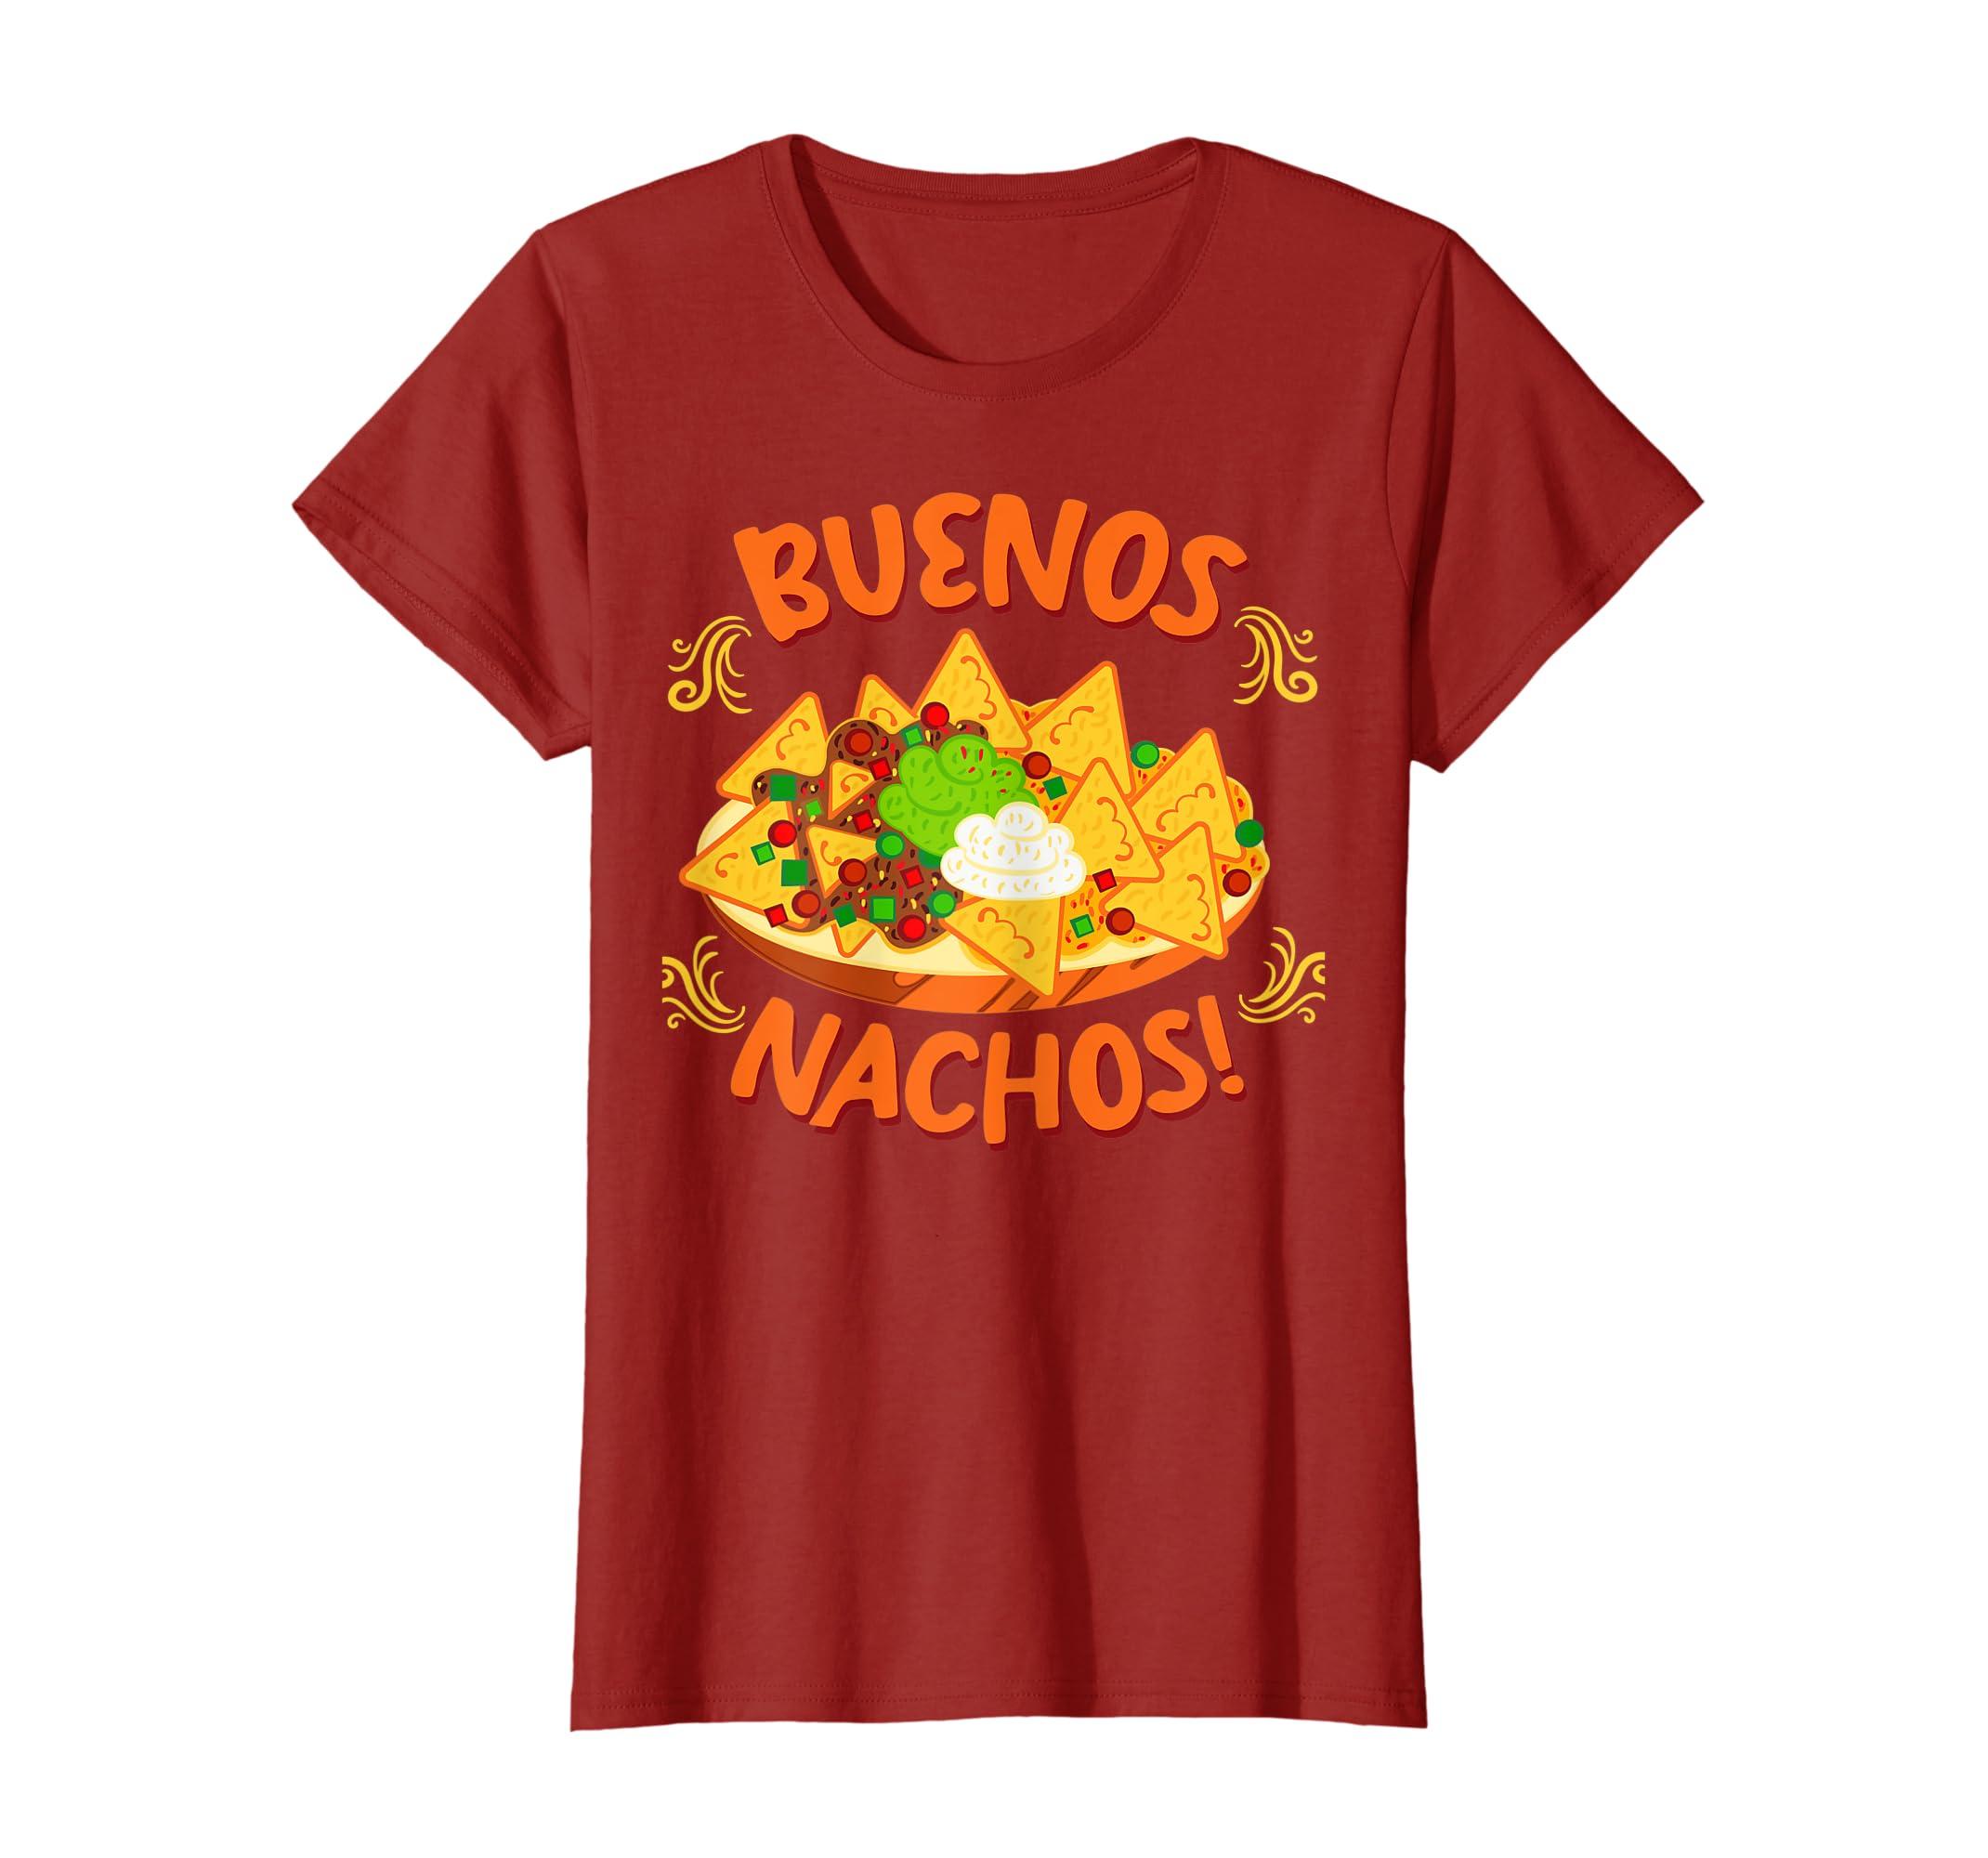 Christmas Cheese Puns.Amazon Com Buenos Nachos Cheese Funny Spanish Puns Vintage